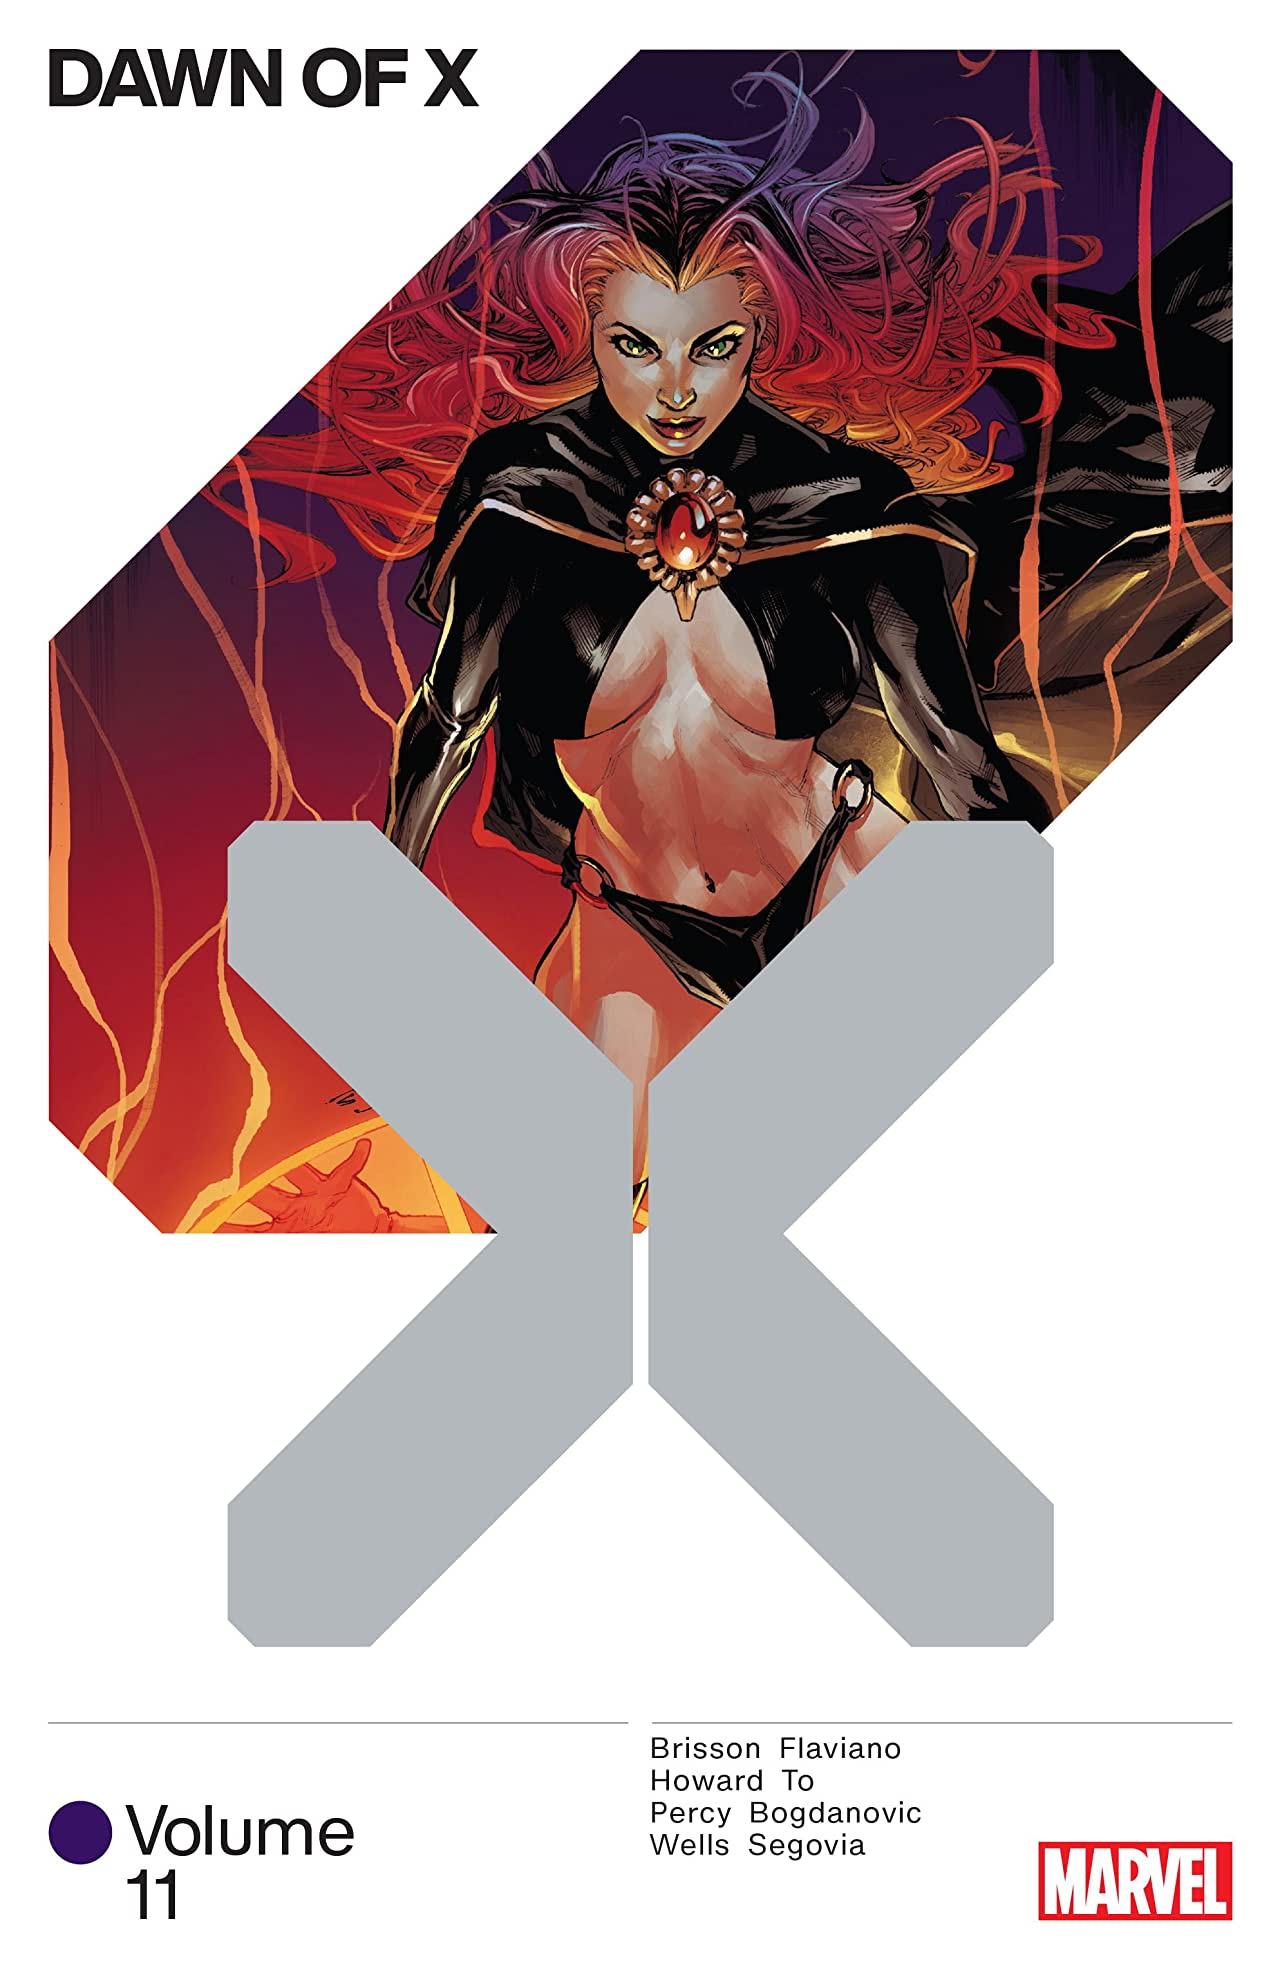 Dawn of X Vol. 11 (Trade Paperback)